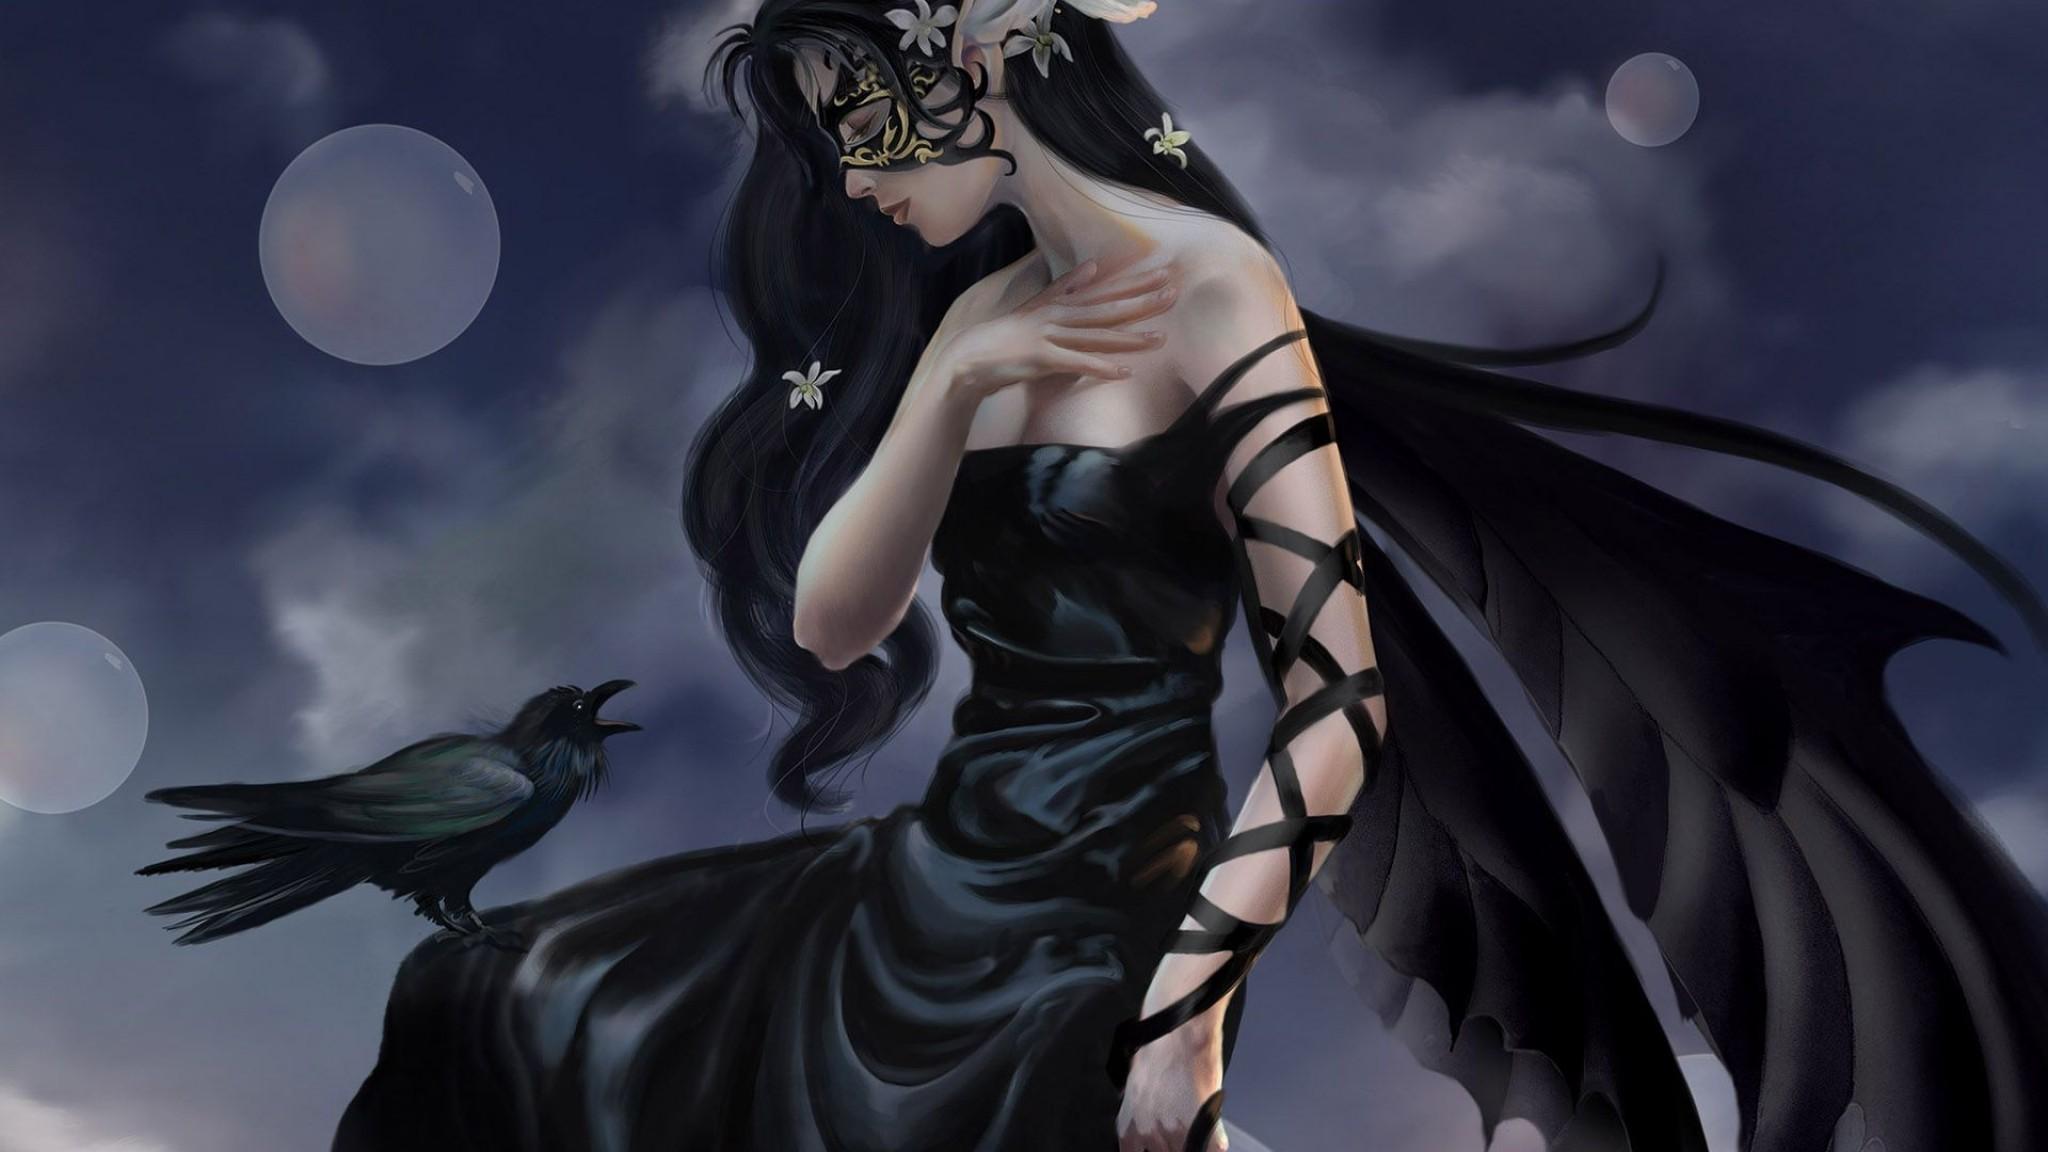 Dark Fairy Wallpapers, wallpaper, Dark Fairy Wallpapers hd .